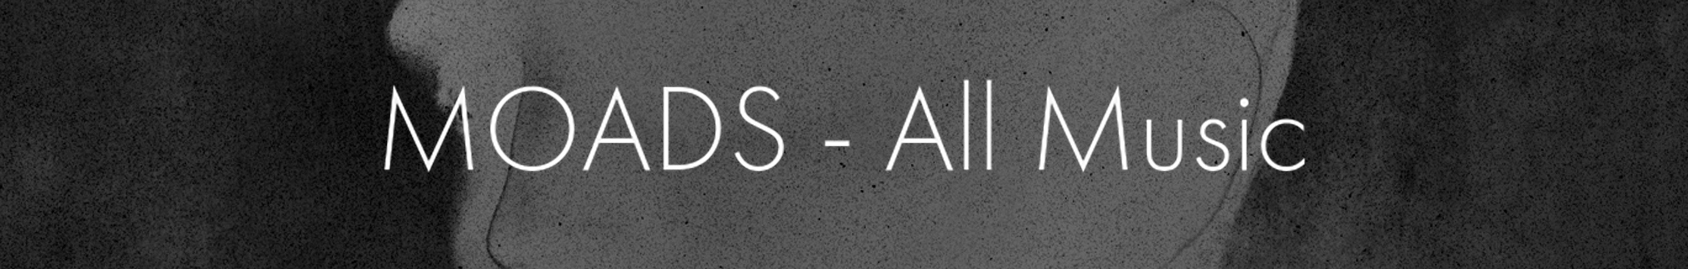 moads all music banner links.jpg